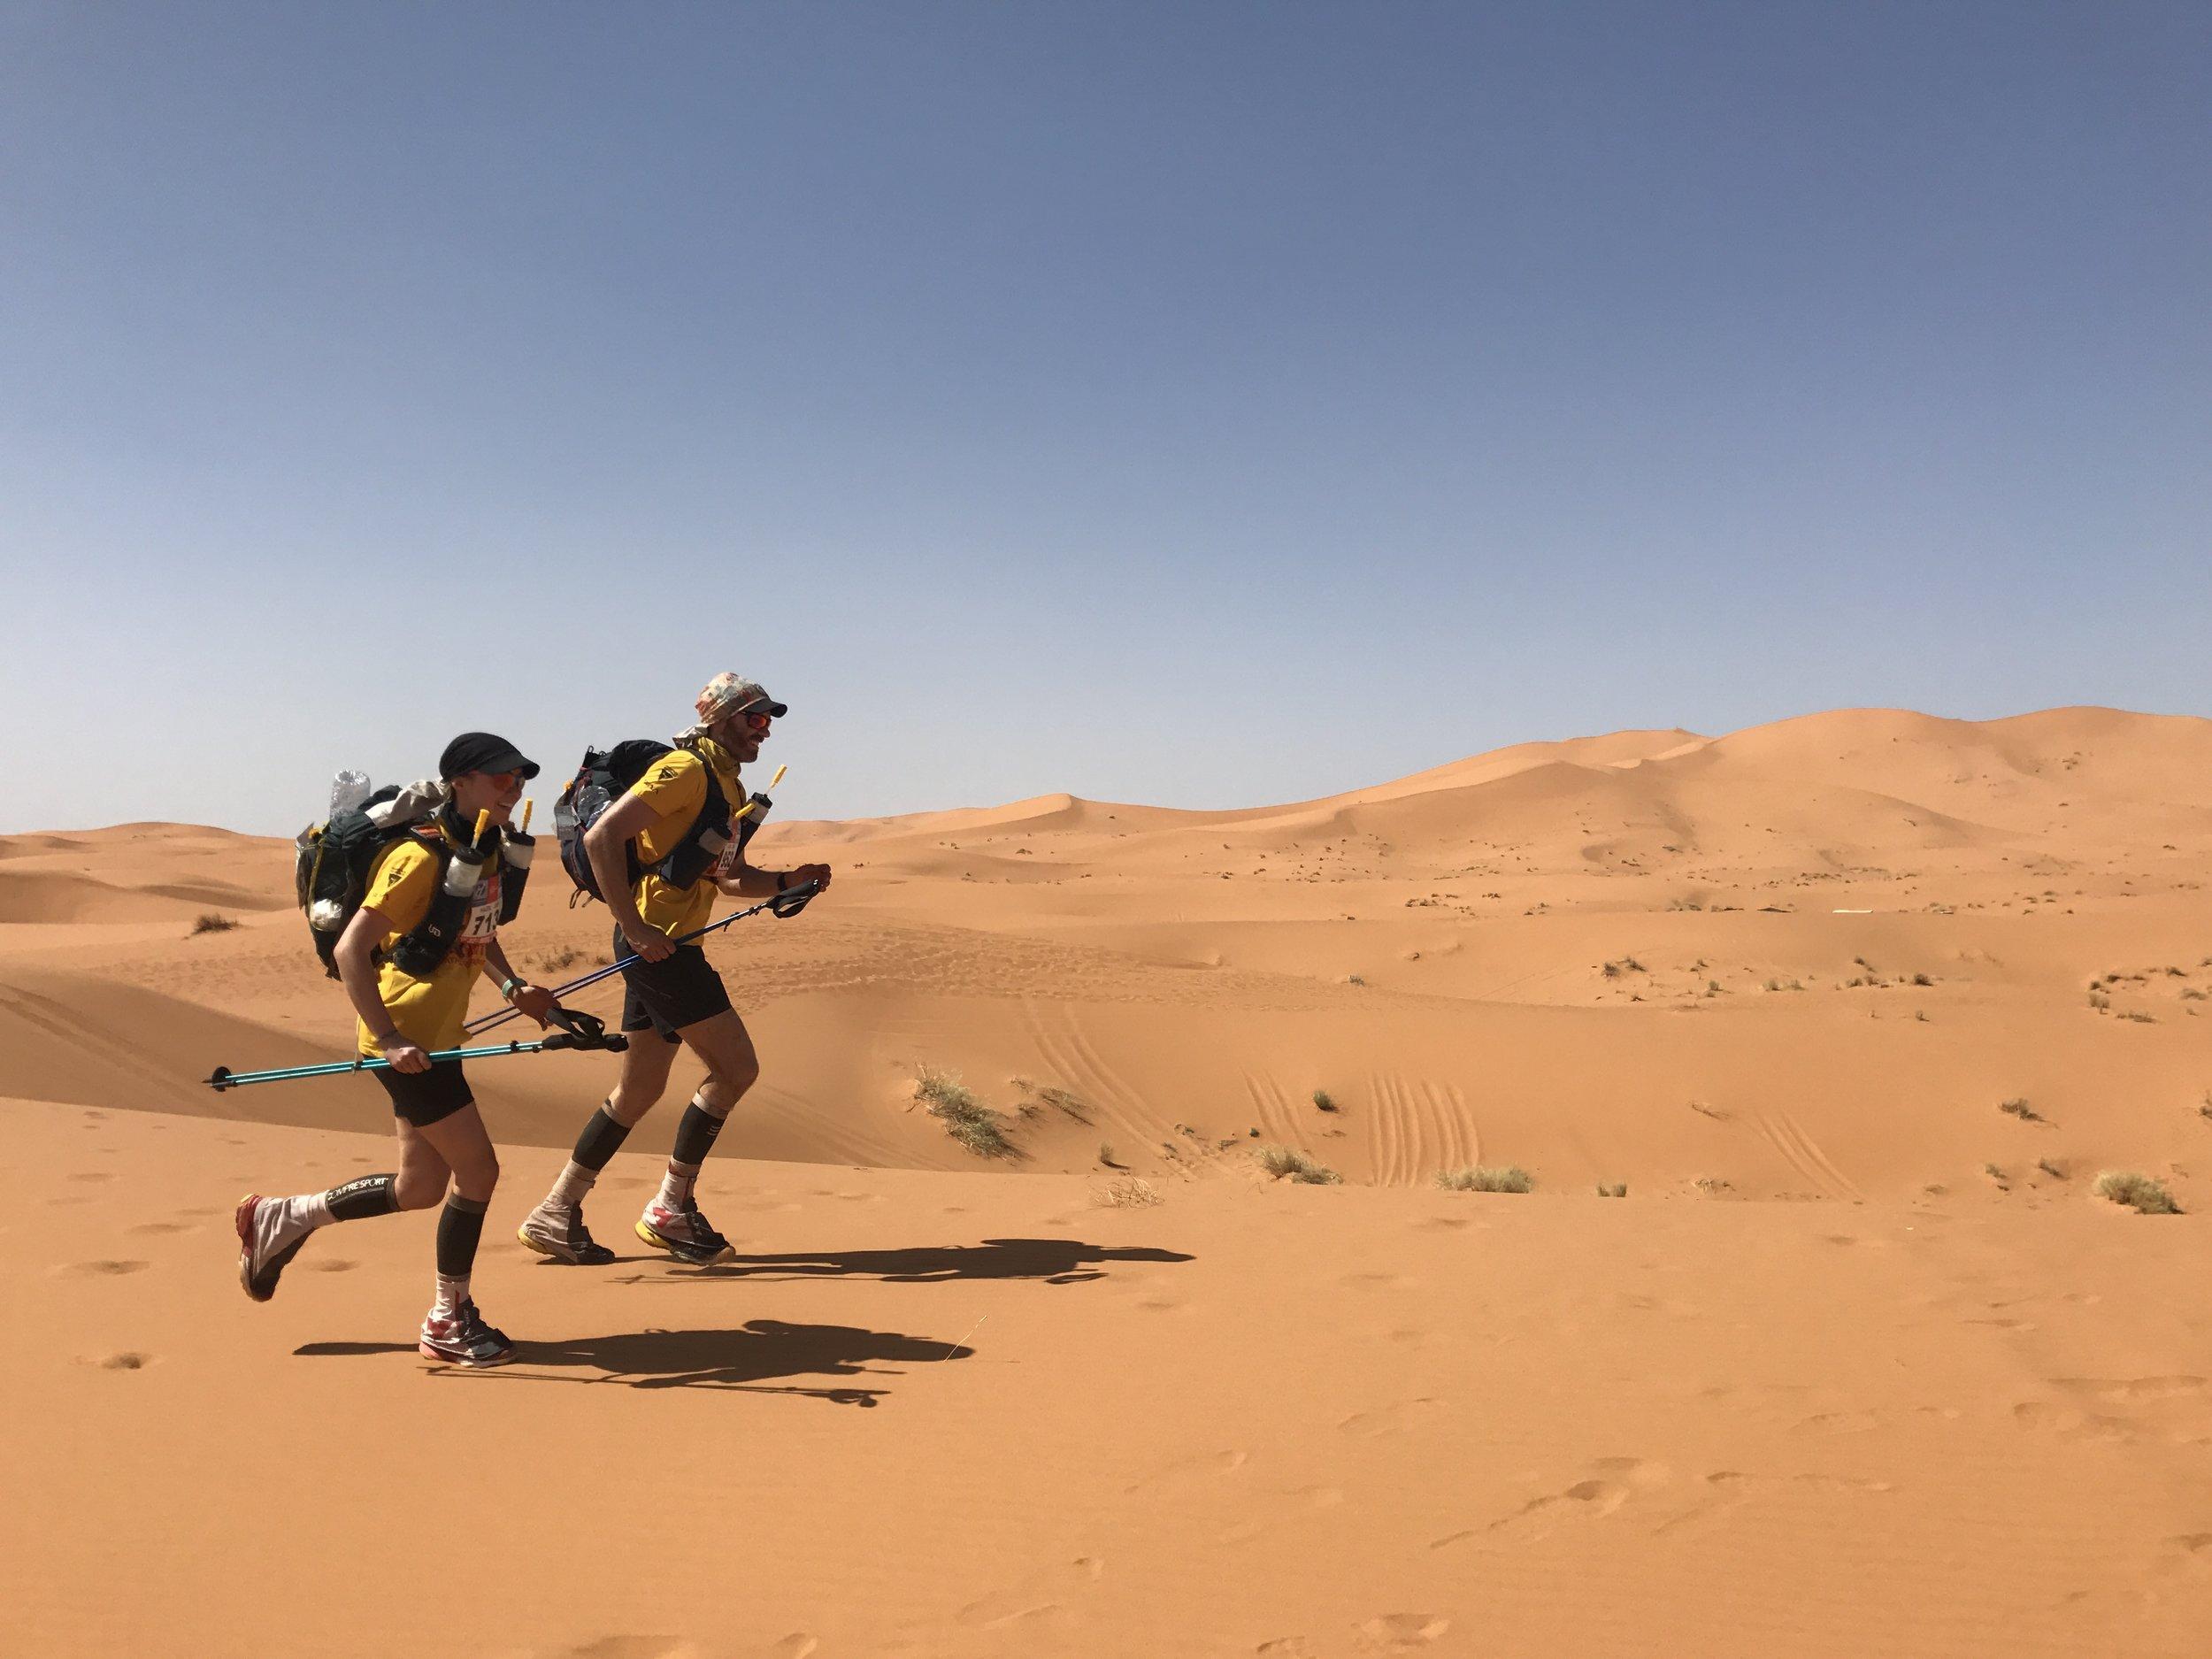 Running the Marathon des Sables in the Sahara Desert